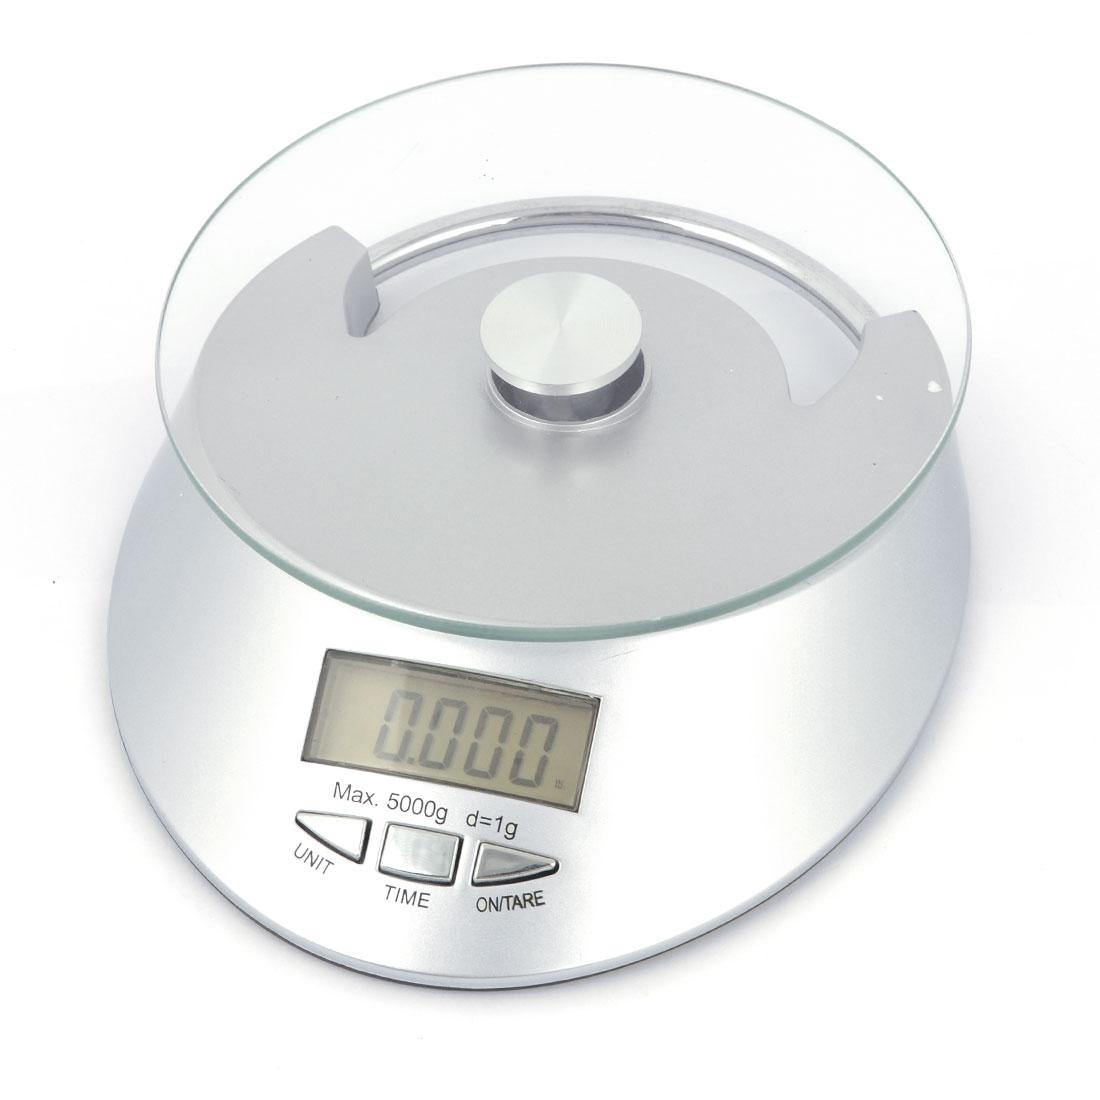 3Kg x 1g Kitchen Digital Electronic Weight Scale Kg oz lb g Silver Tone